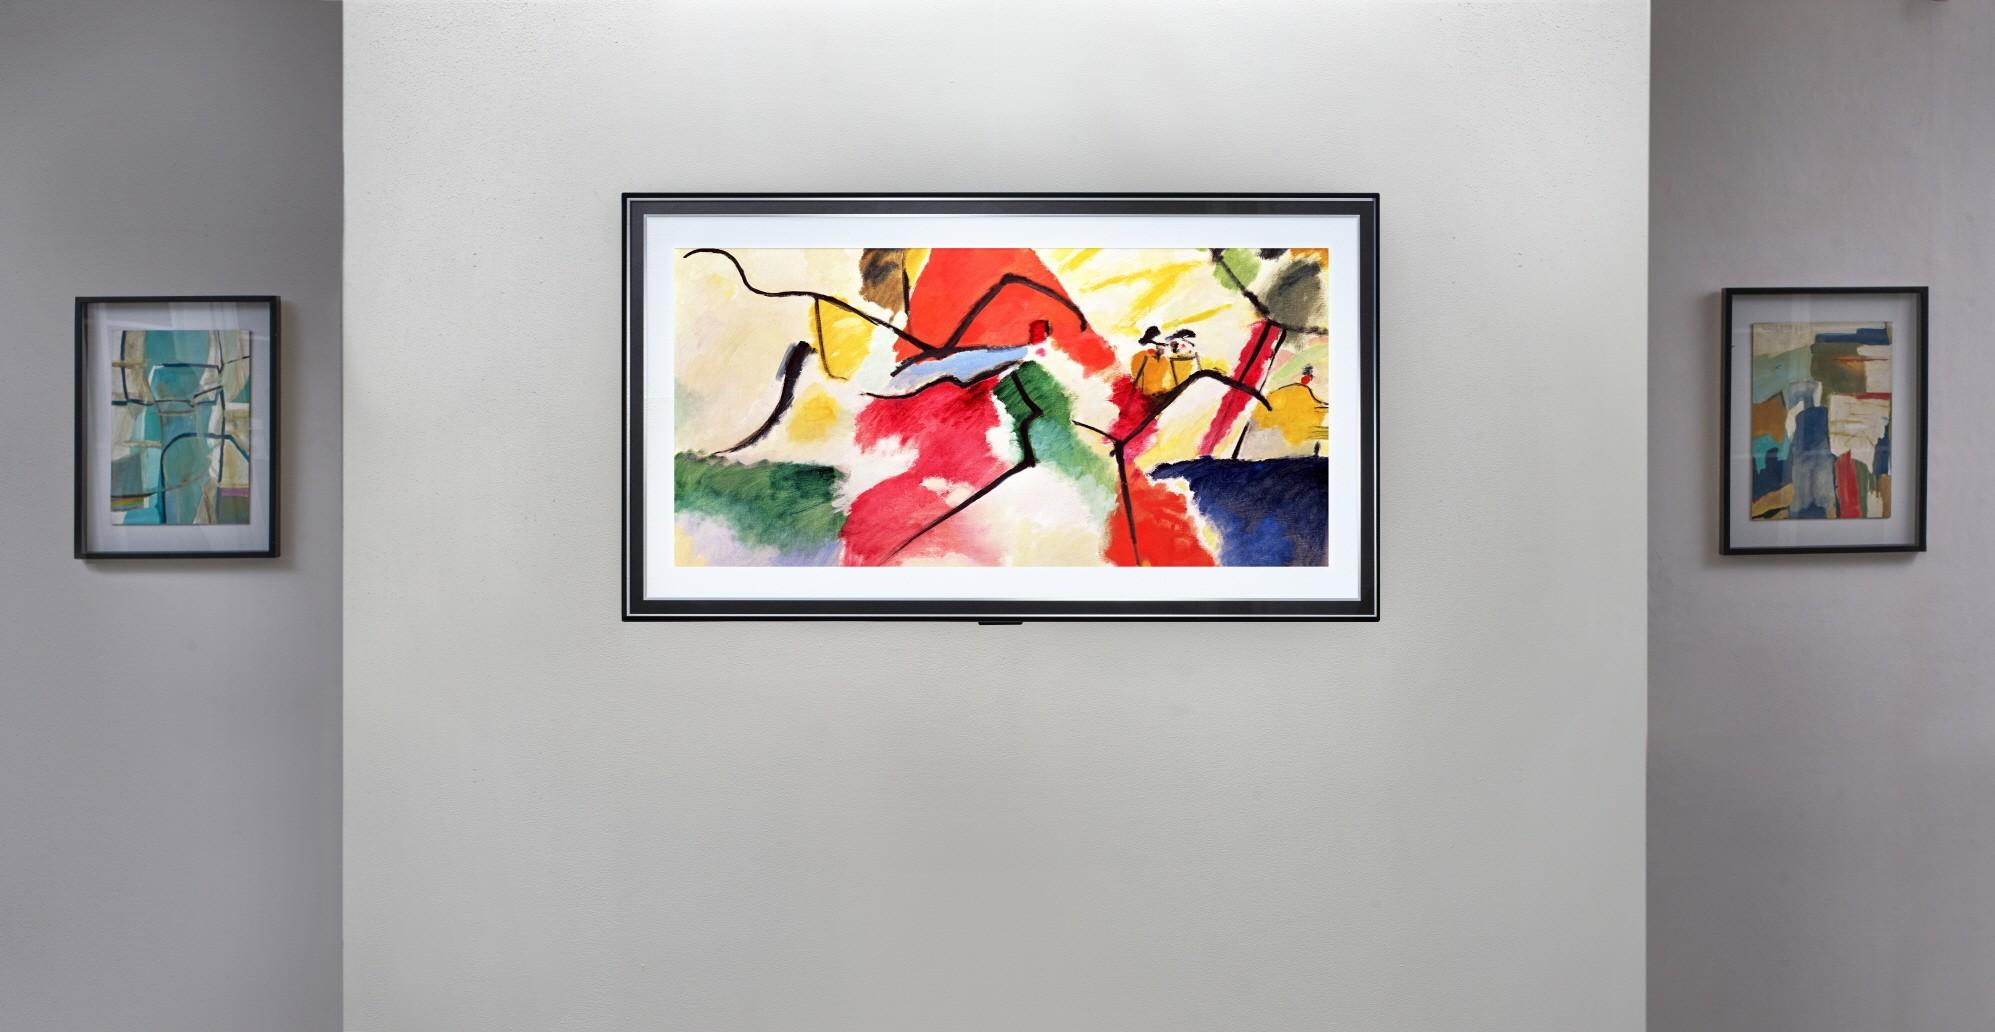 televisores LG Gallery